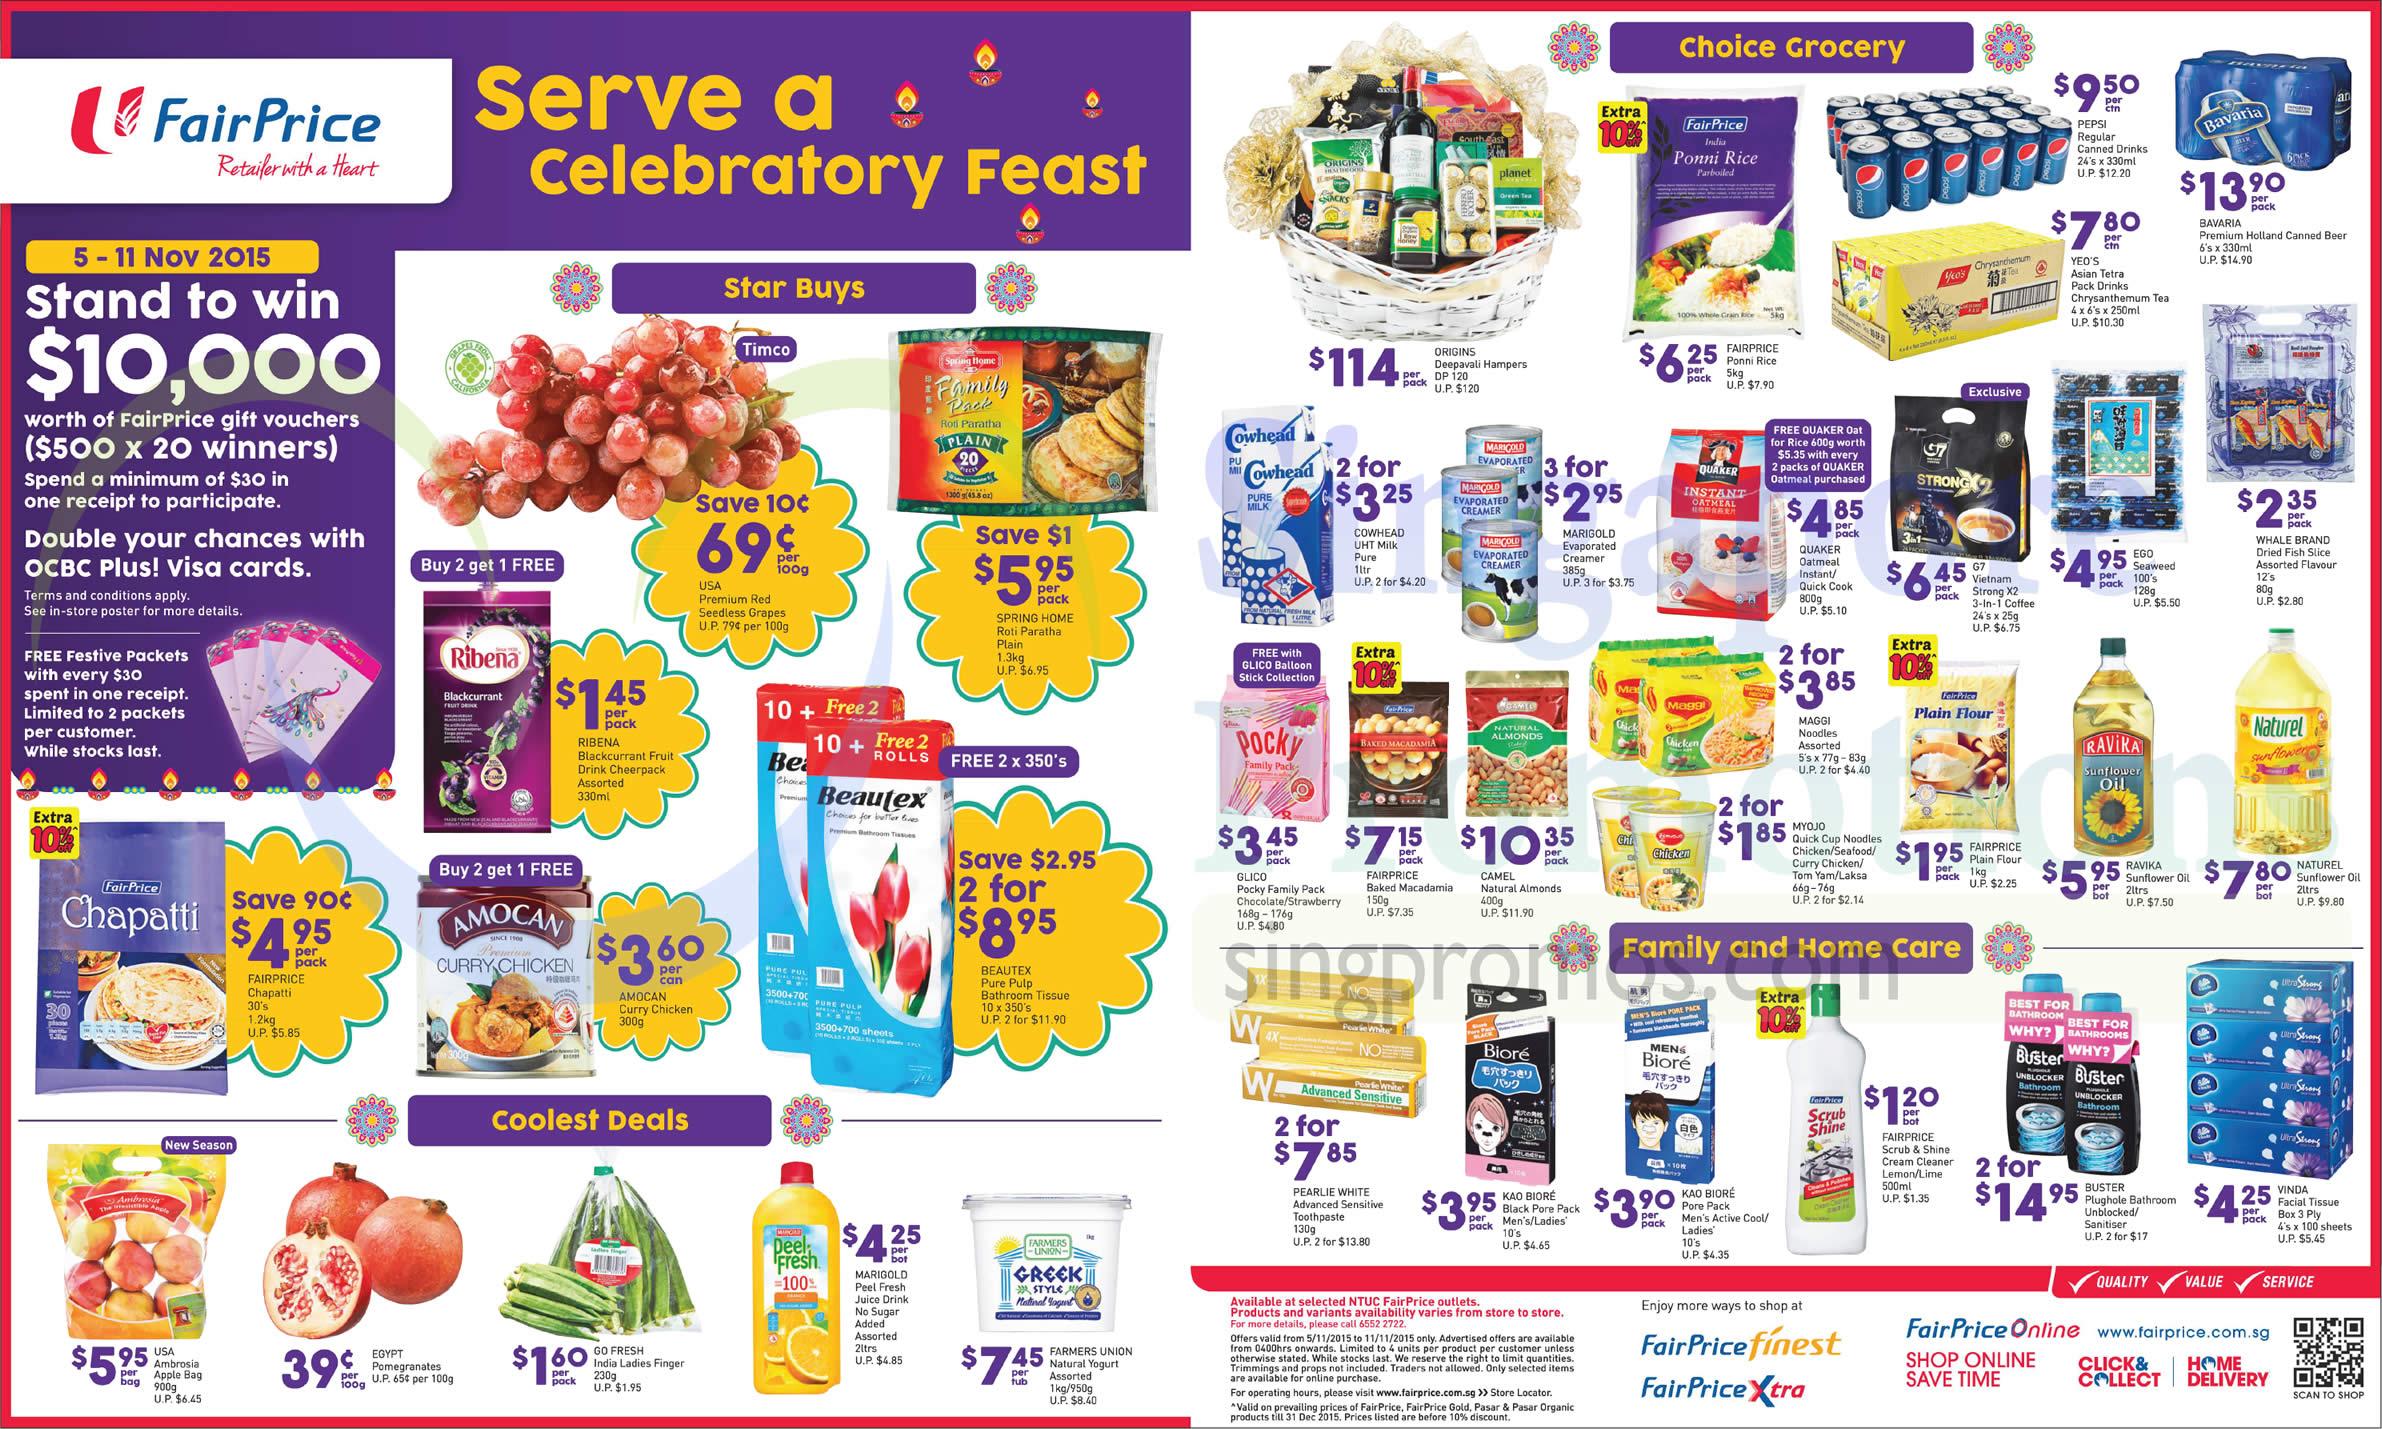 Celebratory Feast Fruits, Groceries, Family, Home Care, Ribena,